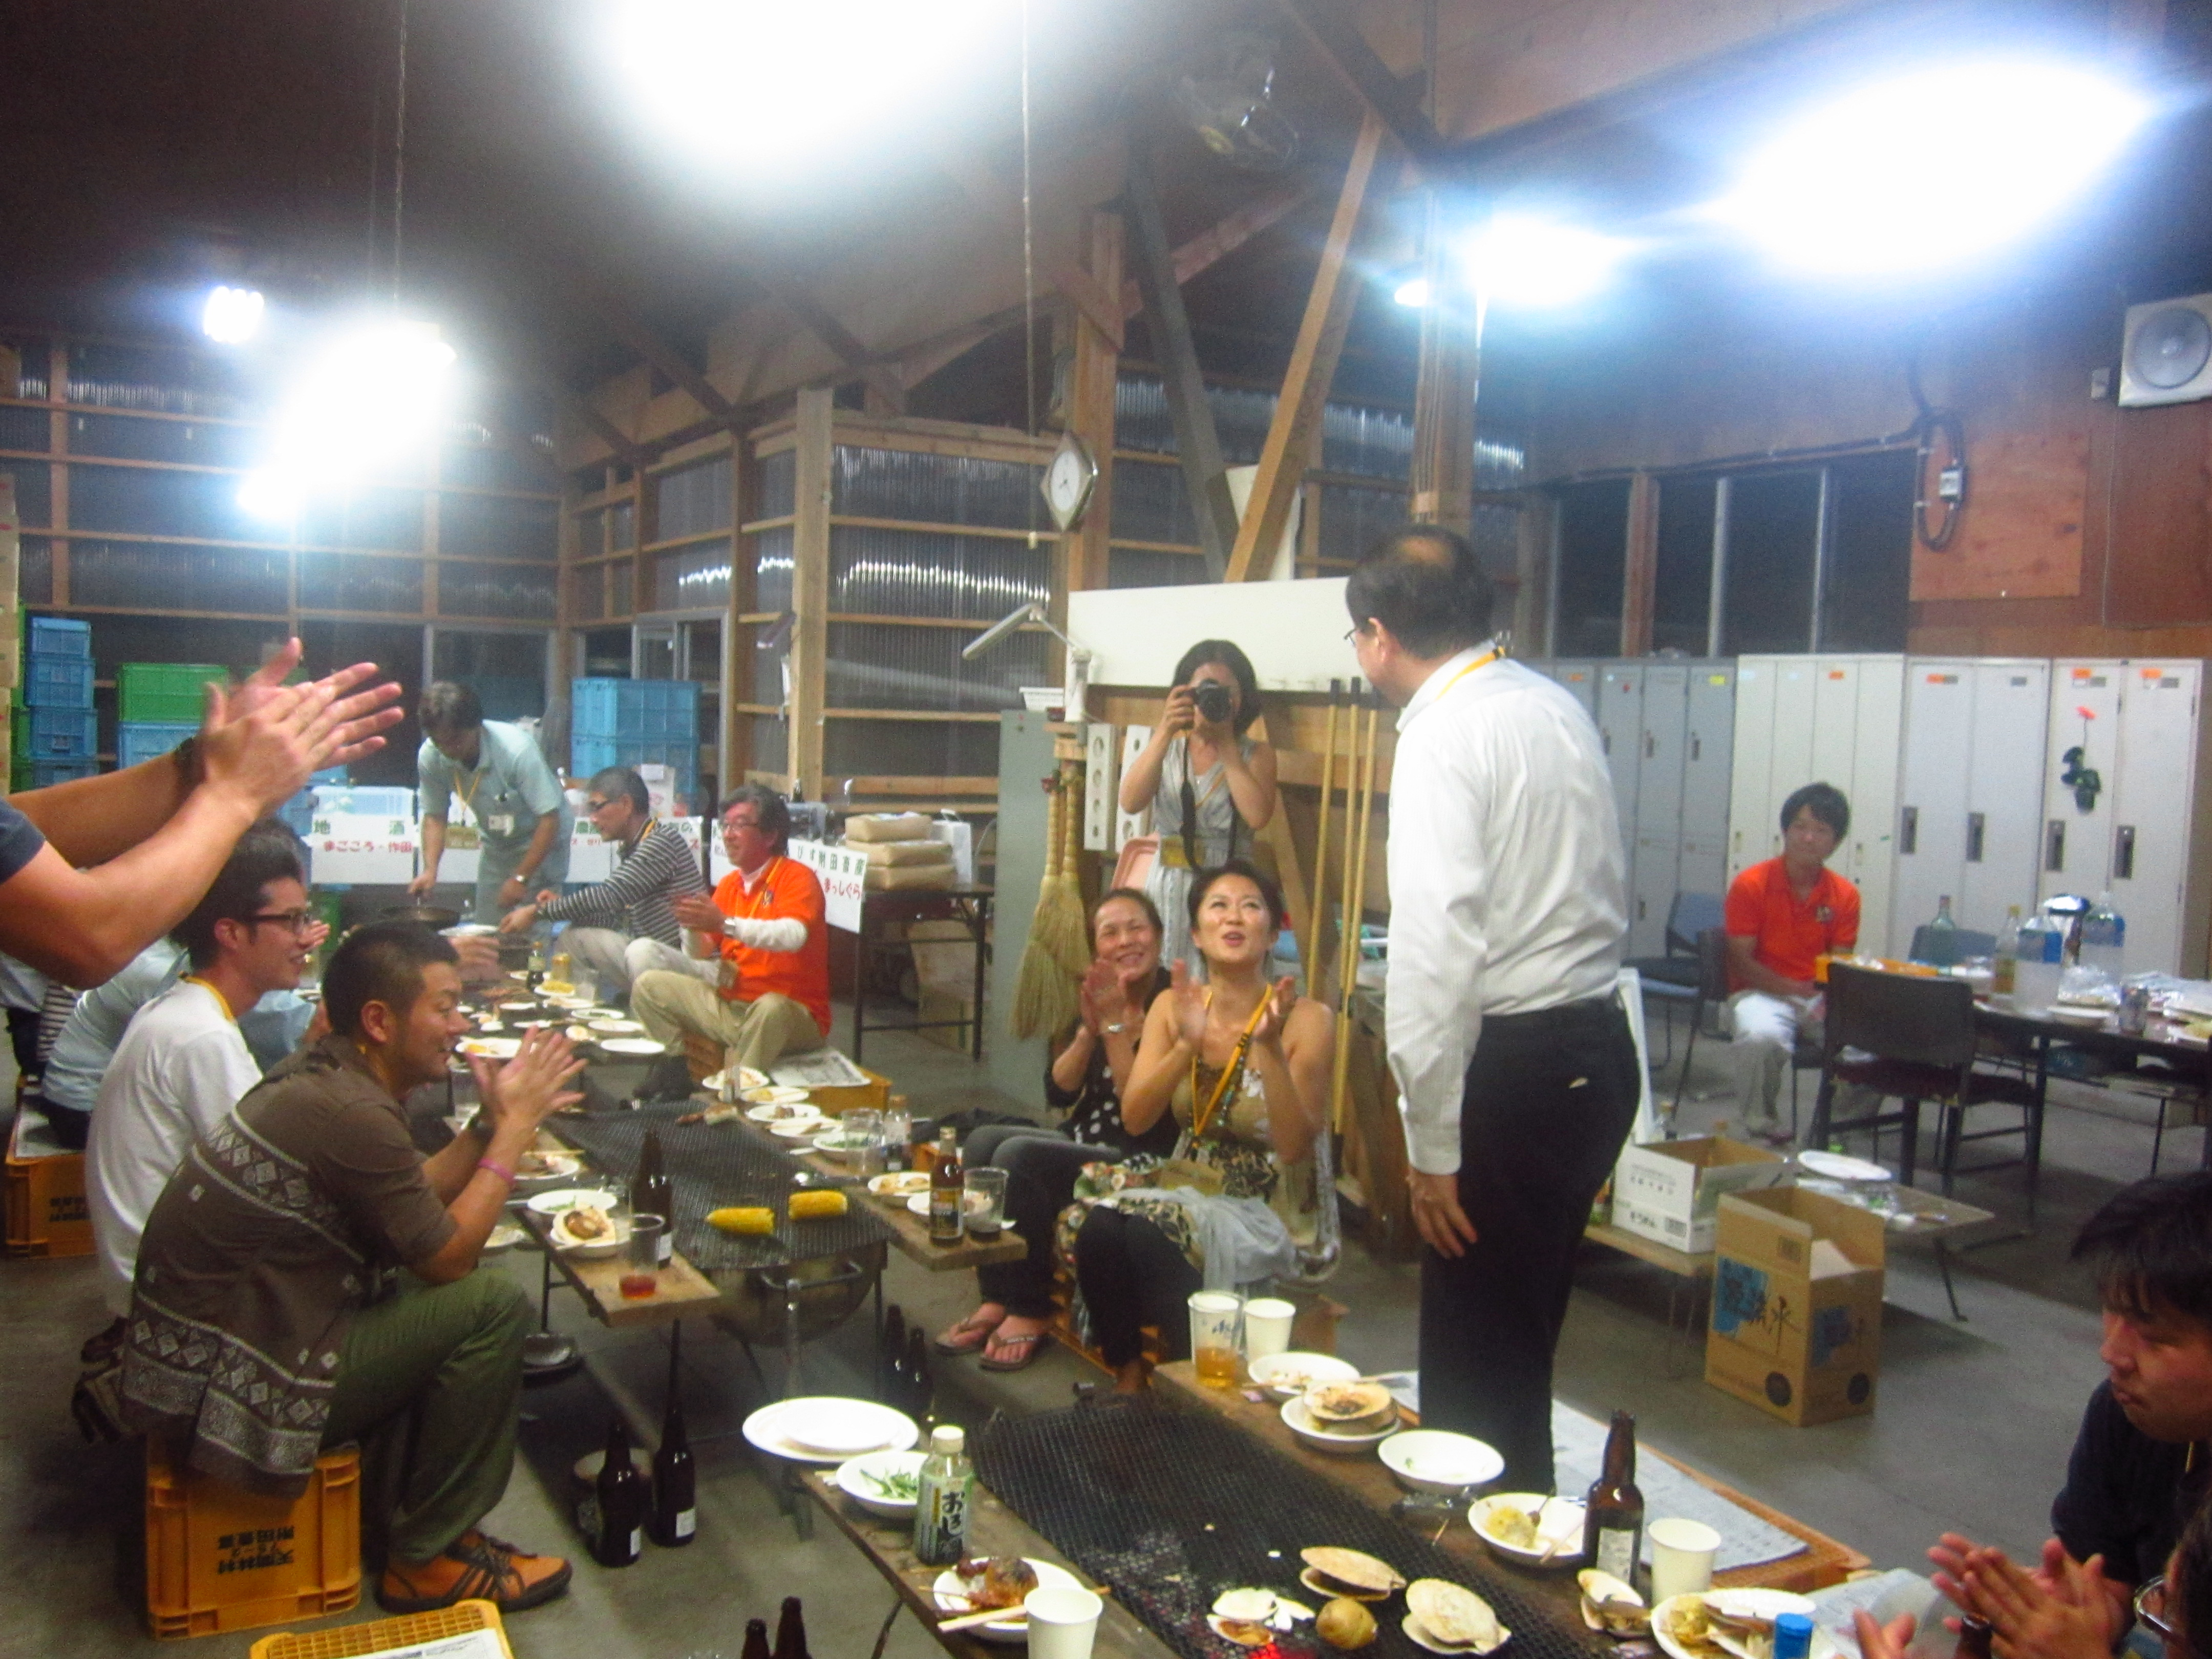 IMG 4354 - 麻布十番納涼祭り25,26日(七戸町出店)